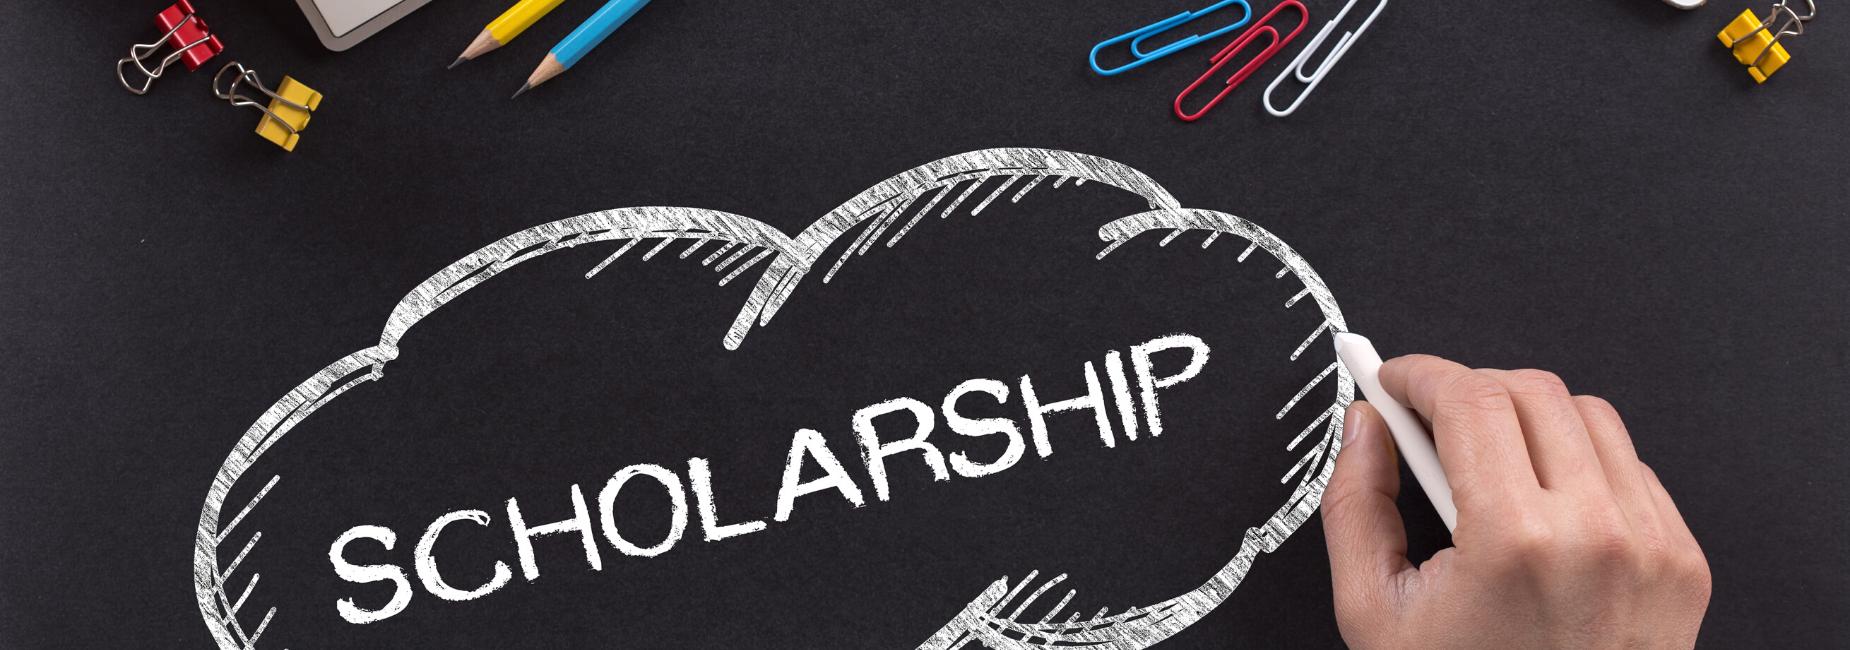 scholarship written in chalk